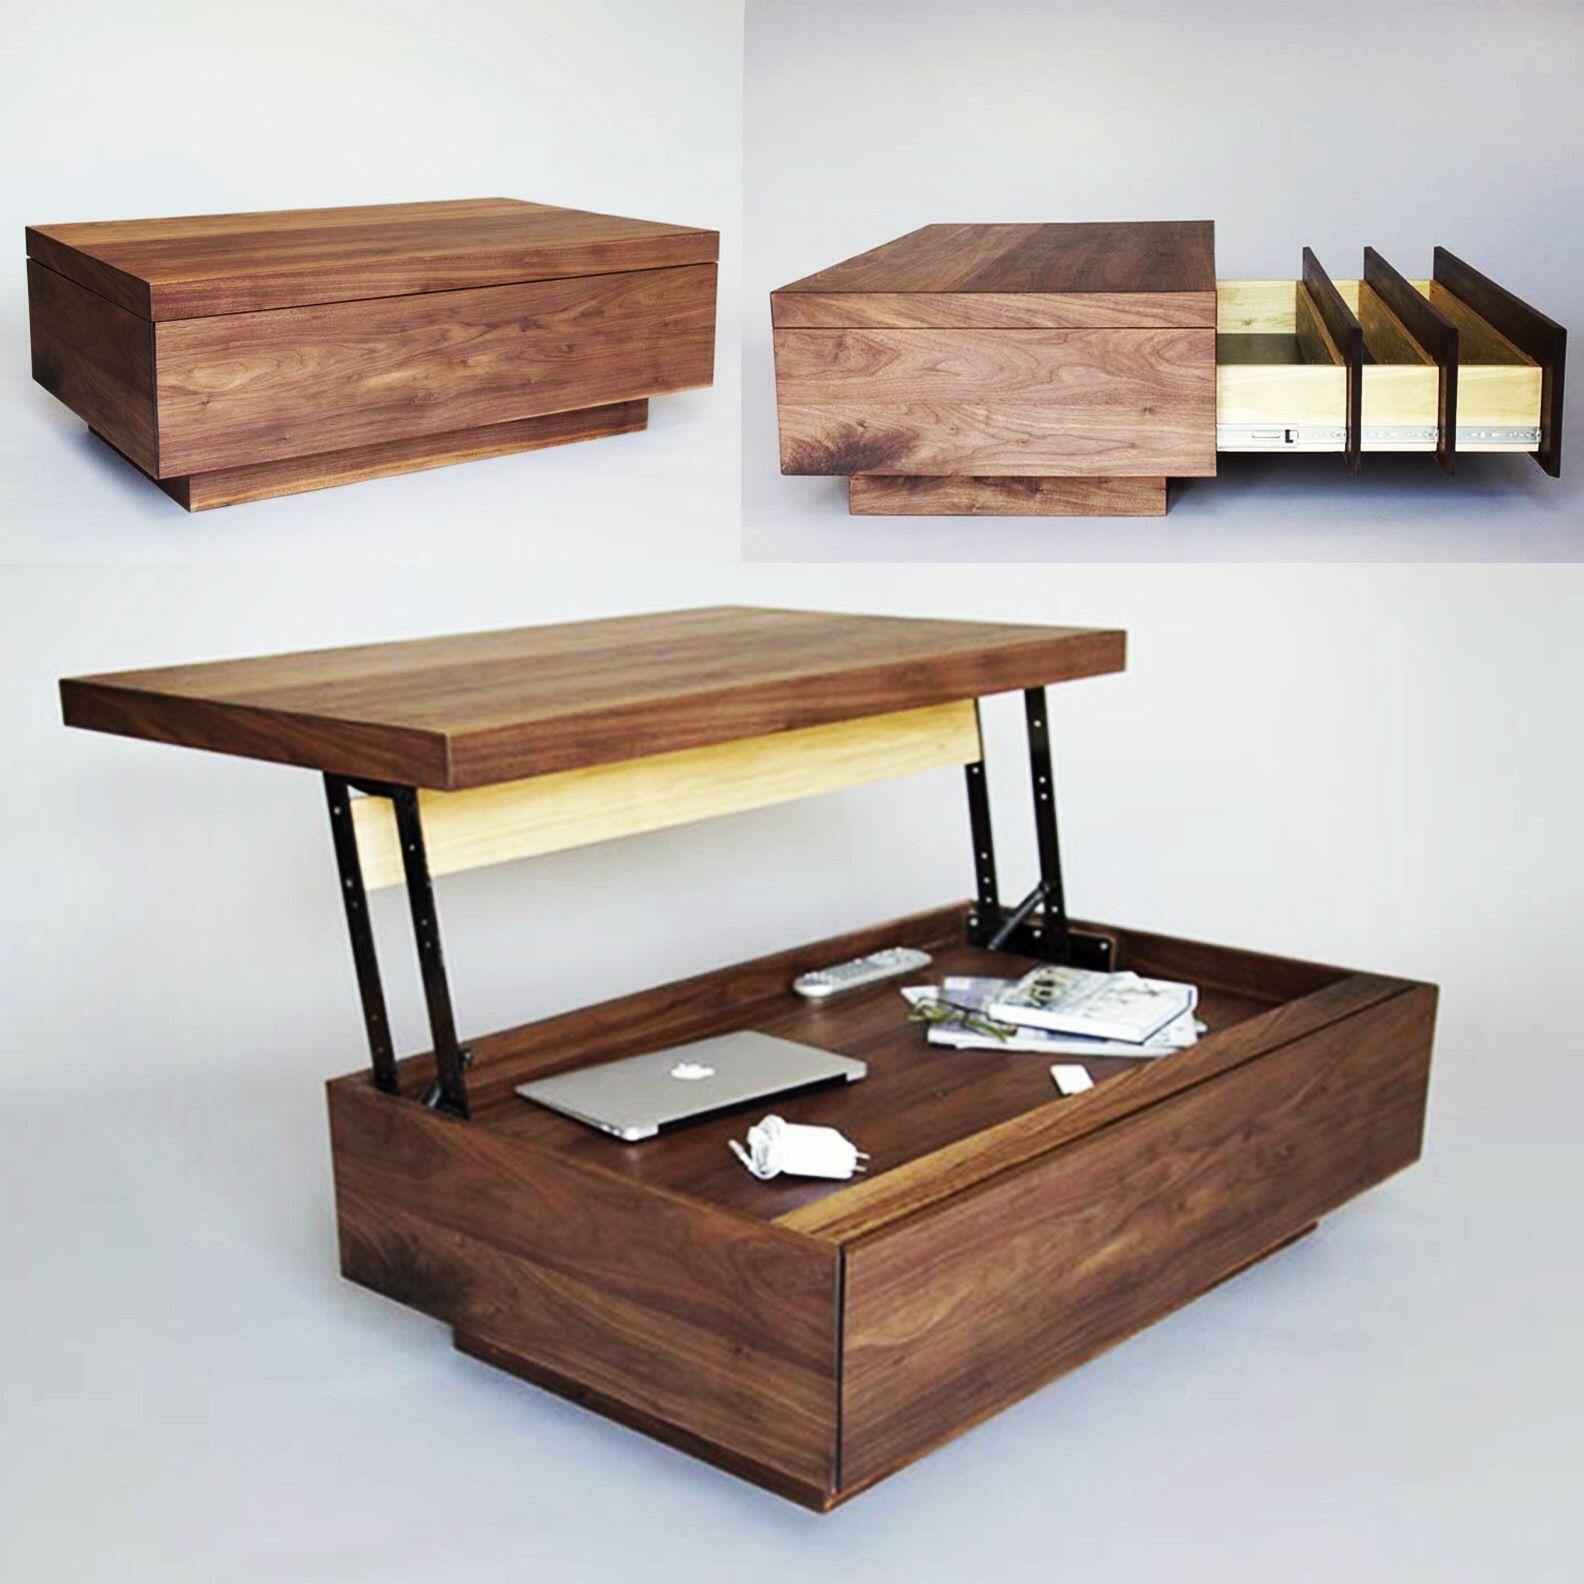 Cabriolet coffee table Multipurpose furniture, Furniture